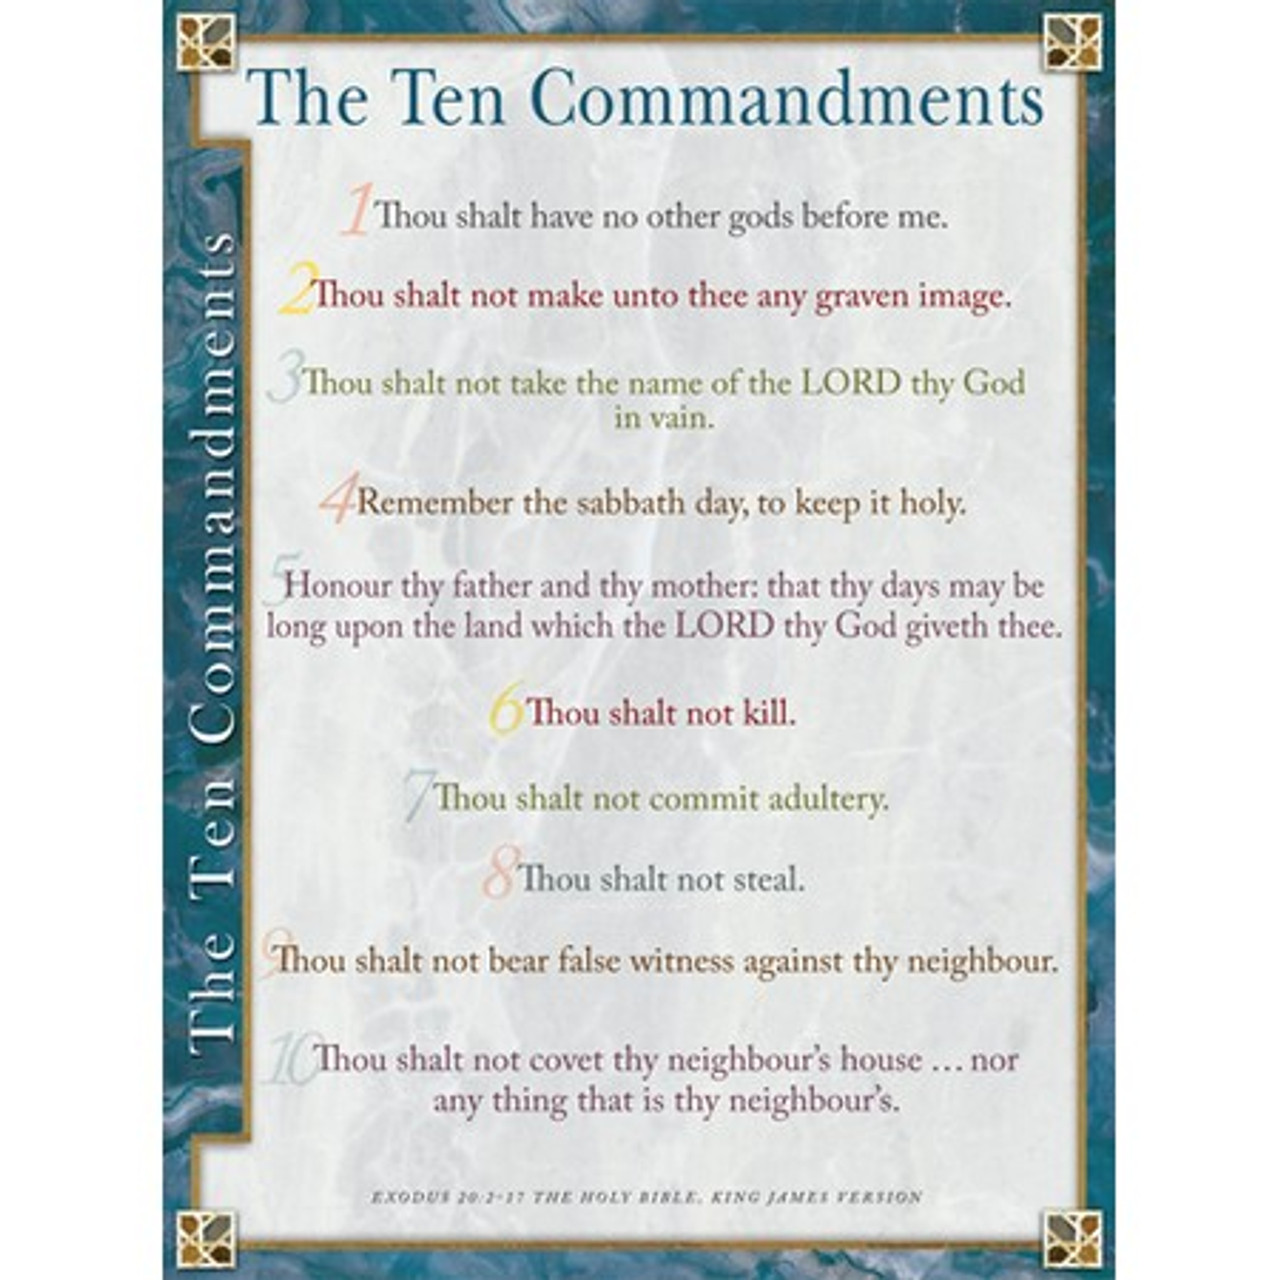 image relating to 10 Commandments Kjv Printable identify 10 Commandments KJV Wall Chart - Laminated